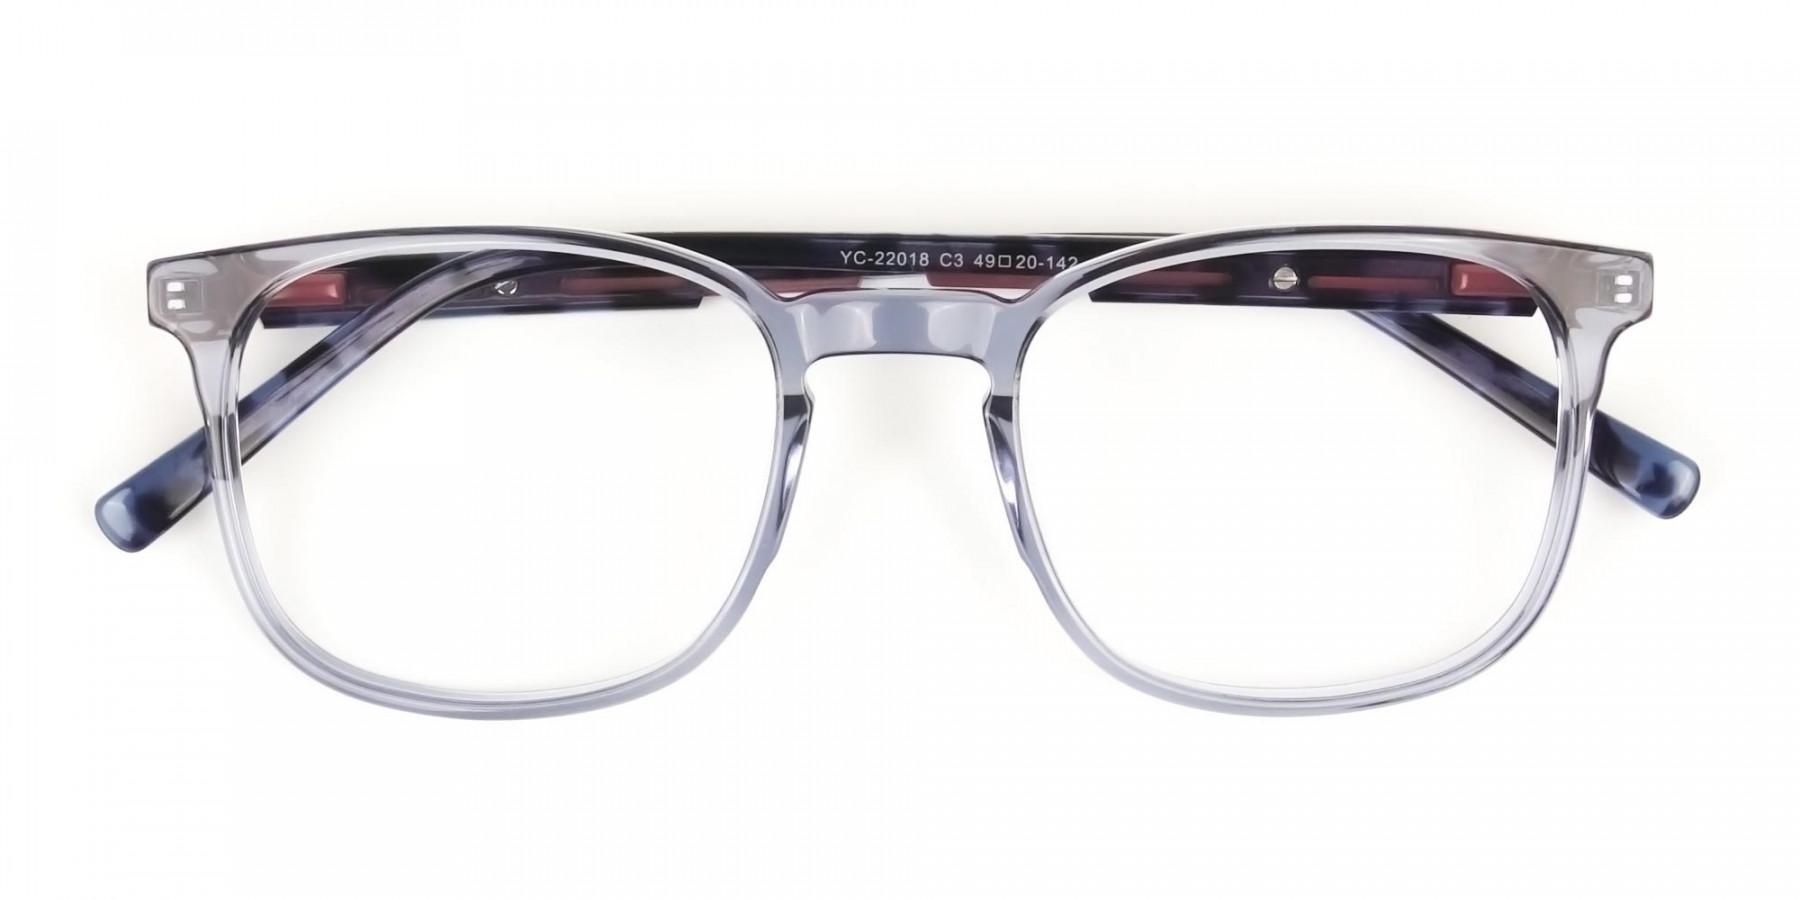 Large Translucent Ocean Blue Tortoise Square glasses - 1